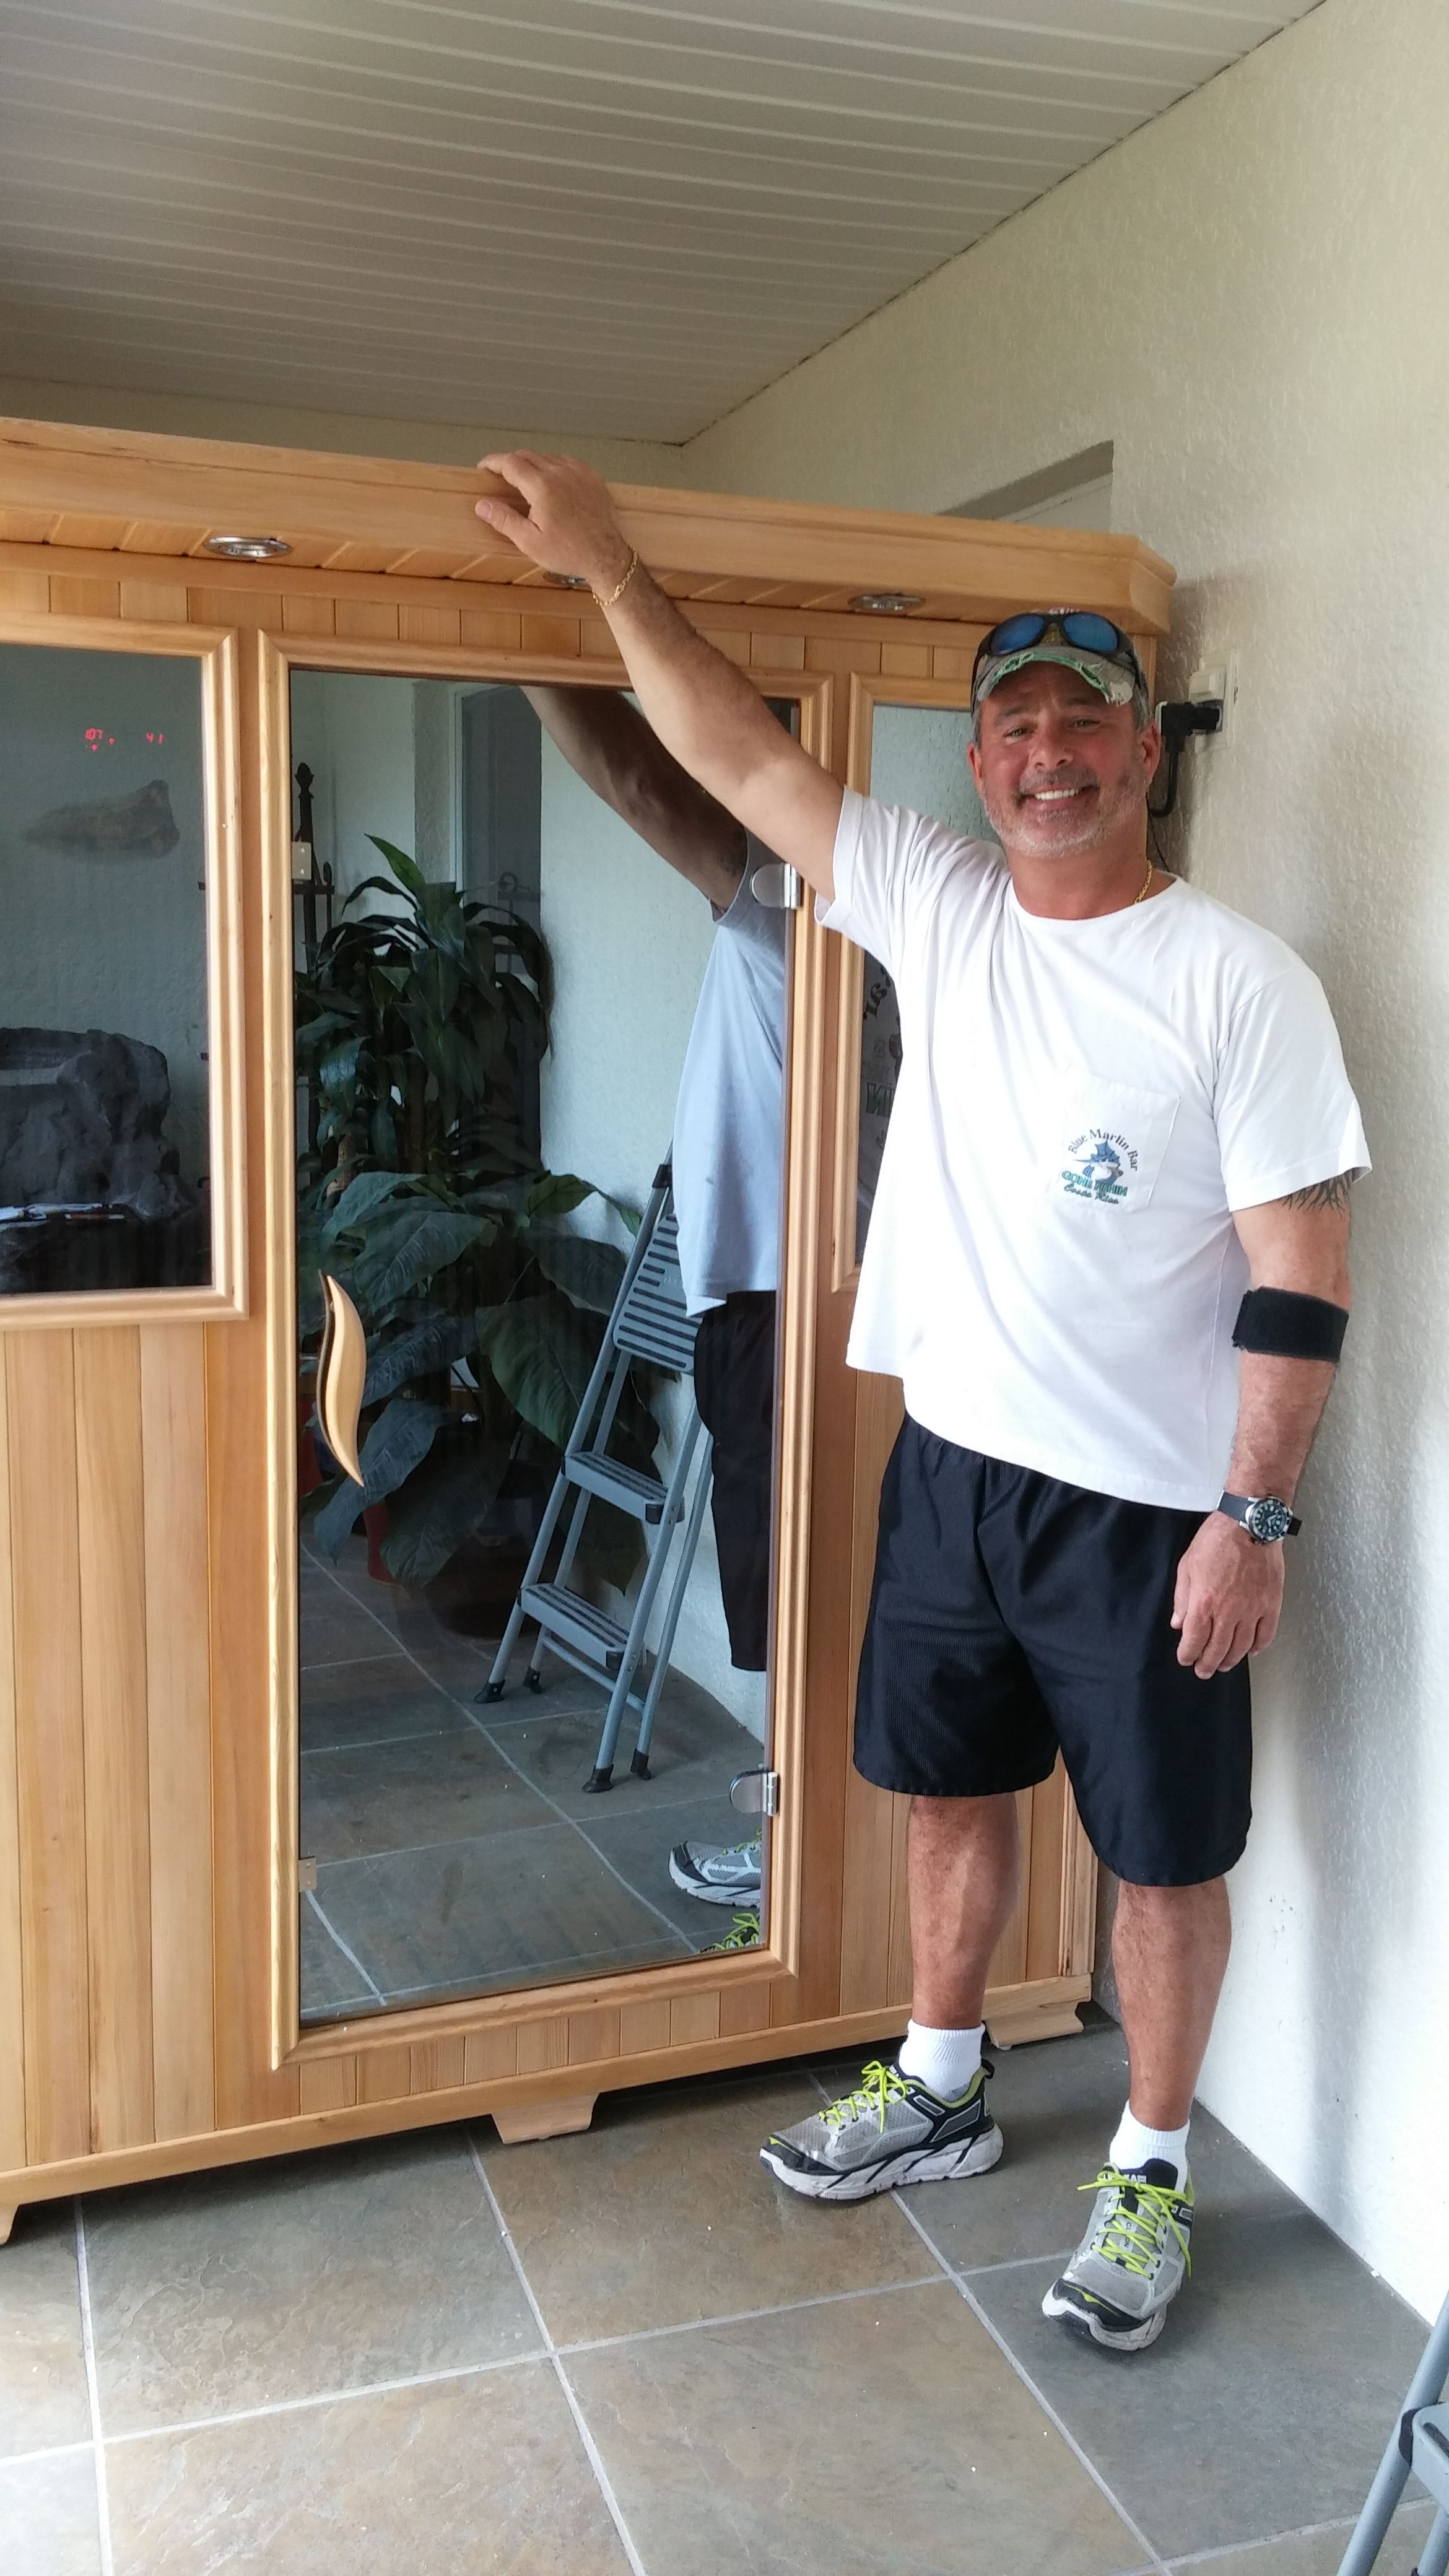 Good health saunas gs 3person infrared sauna hemlock wood